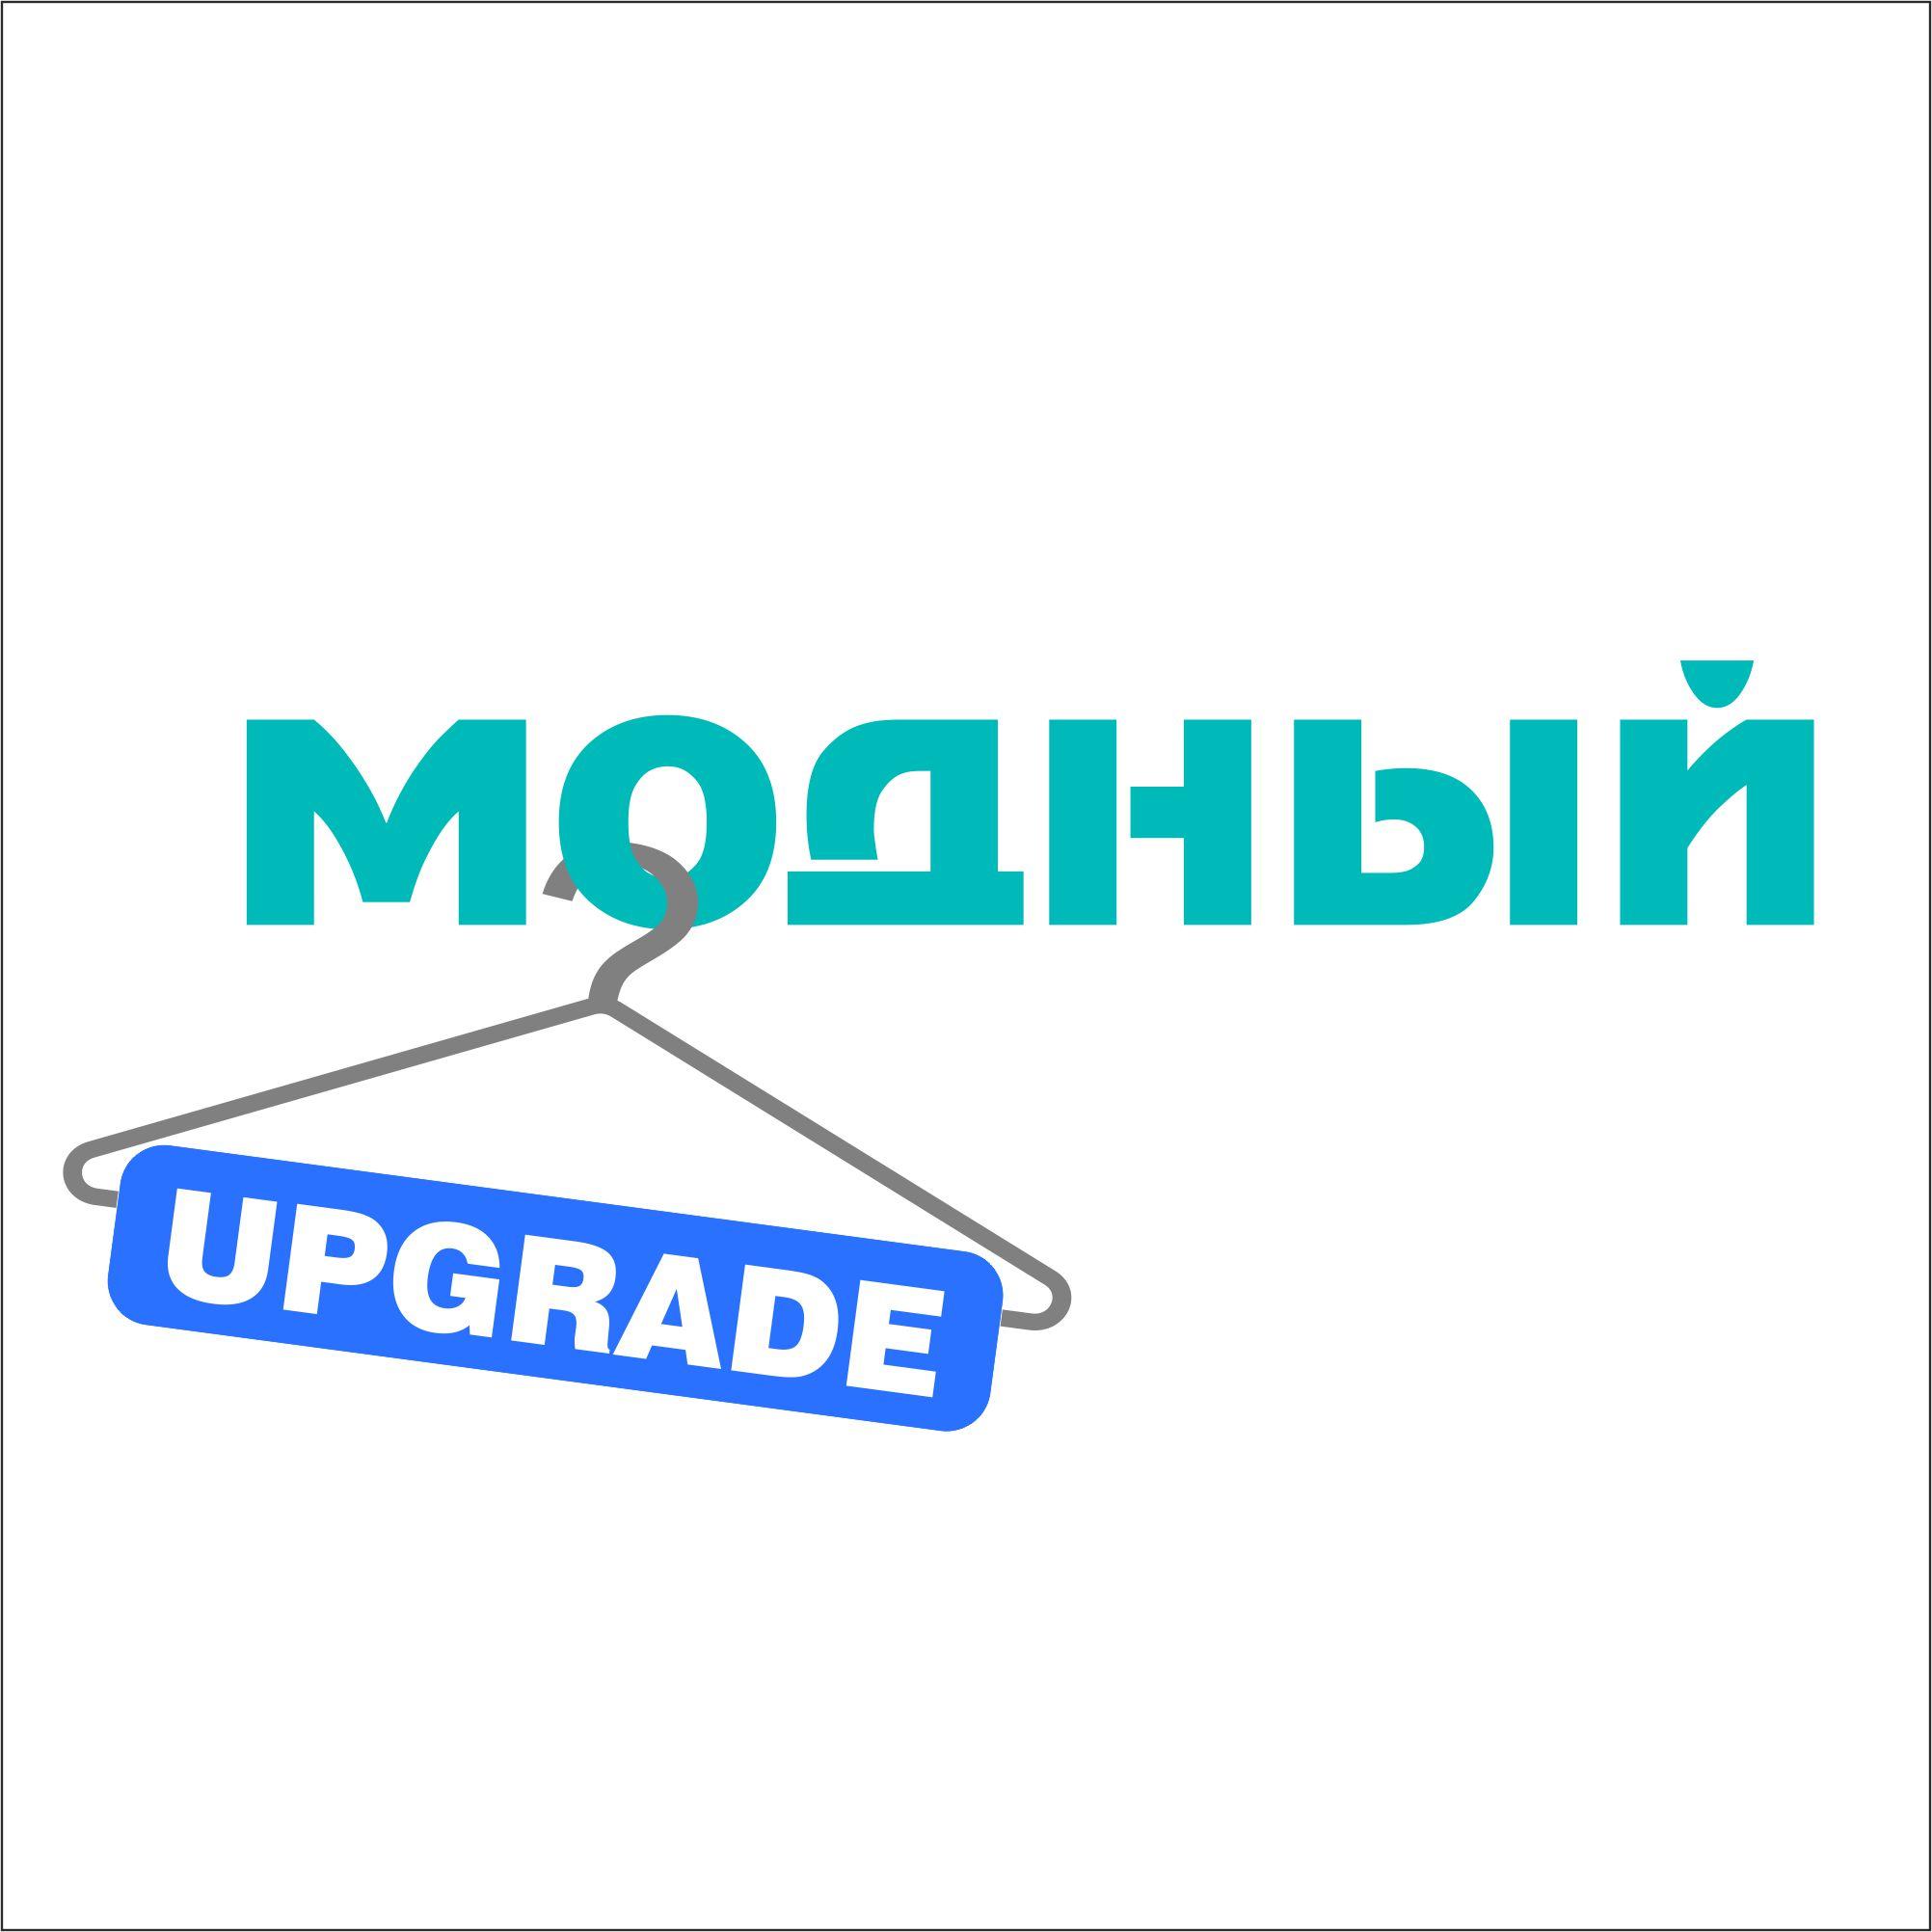 "Логотип интернет магазина ""Модный UPGRADE"" фото f_74659427b2425616.jpg"